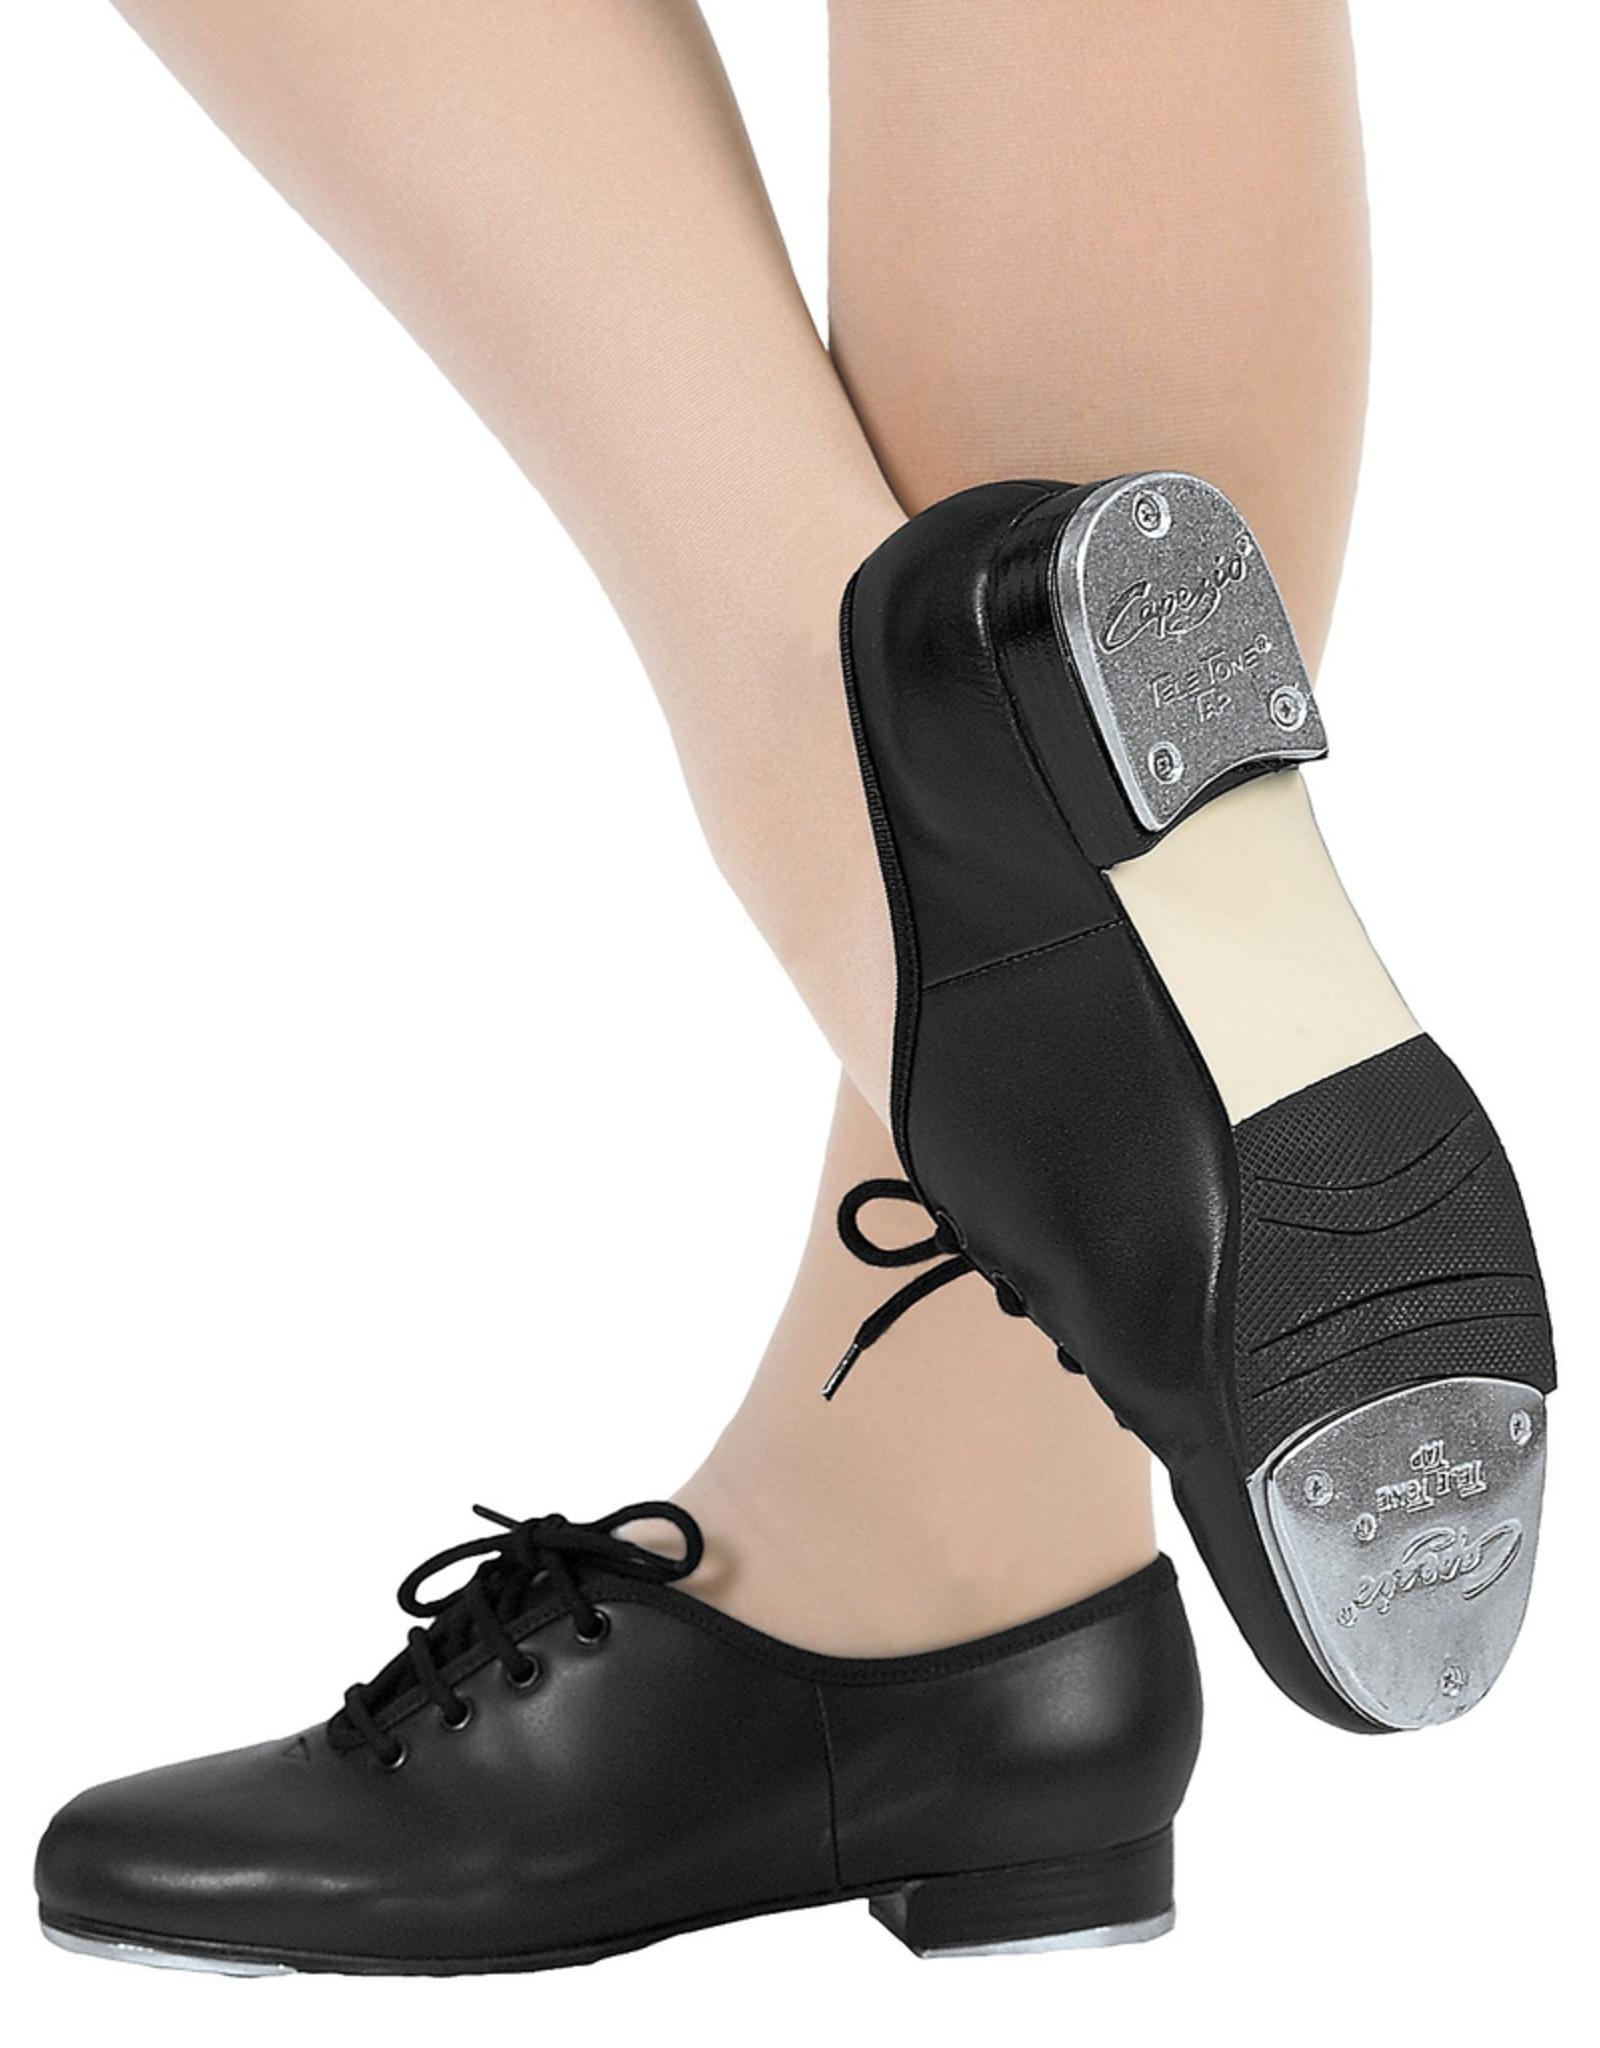 Capezio CG55 Tele Tone Xtreme Full Sole Tap Shoe Adult